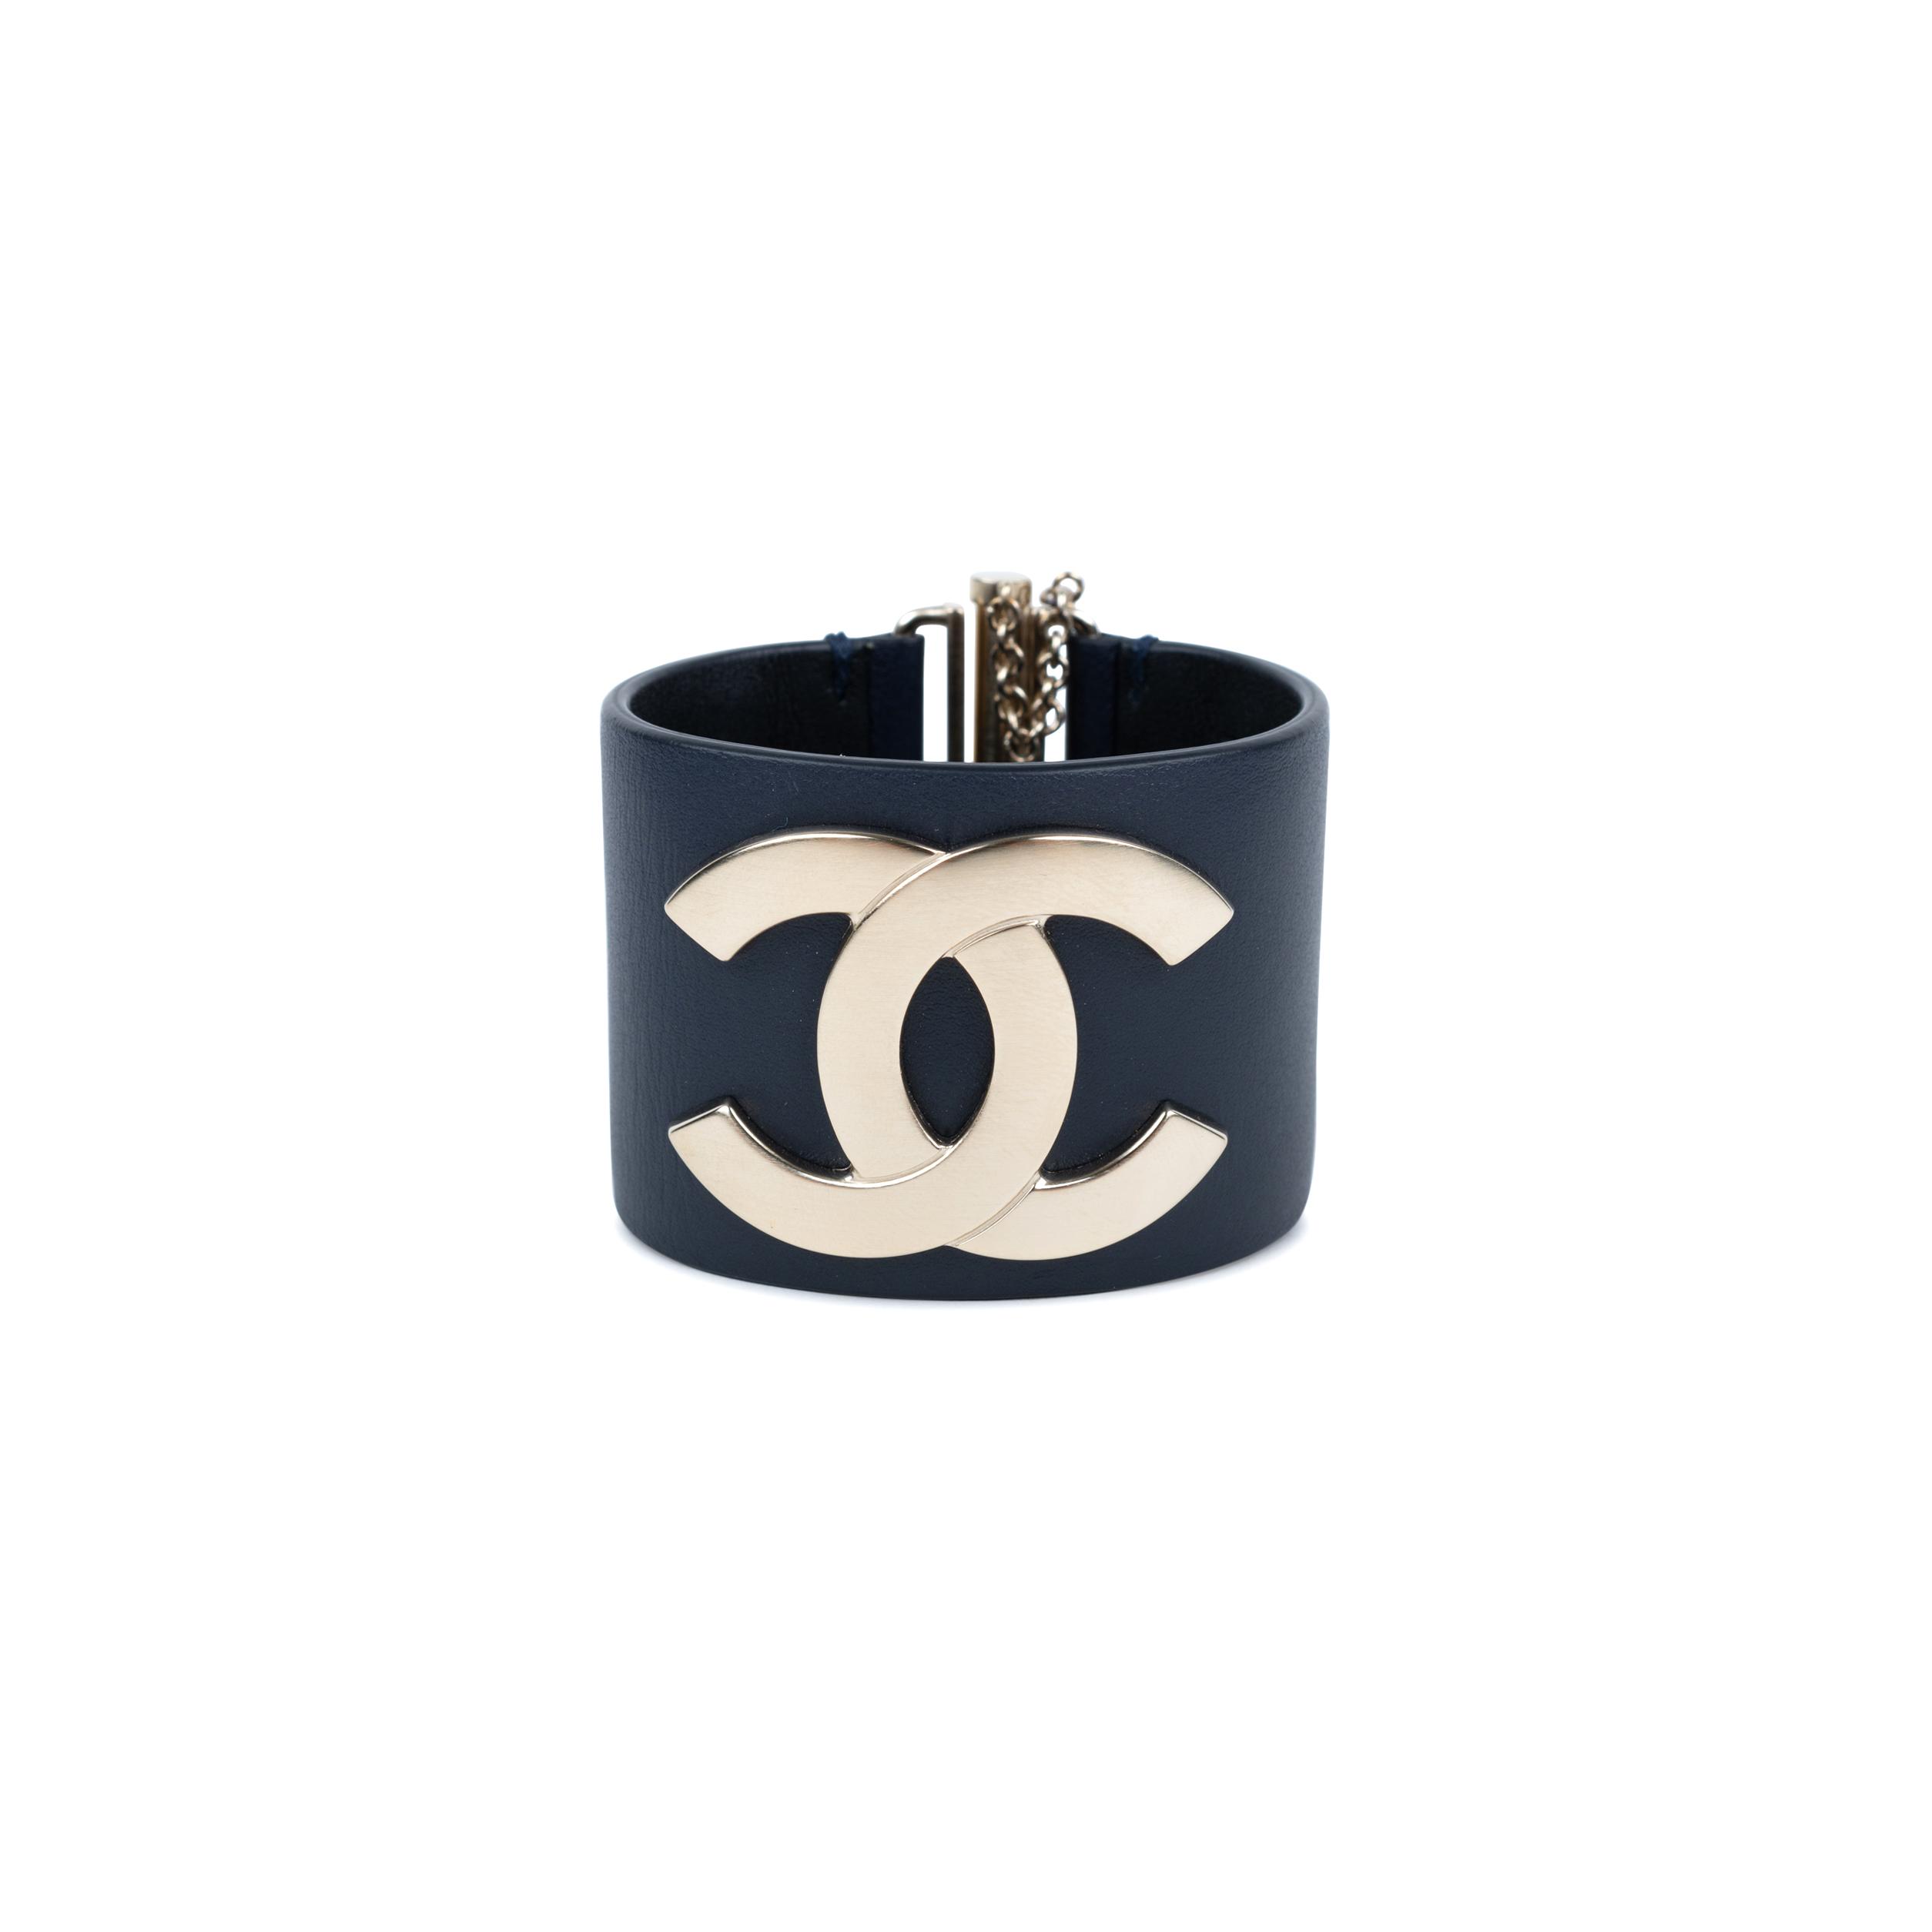 Authentic Pre Owned Chanel  CC  Leather Cuff Bracelet (PSS-559-00004 ... 10a1e6e25d21